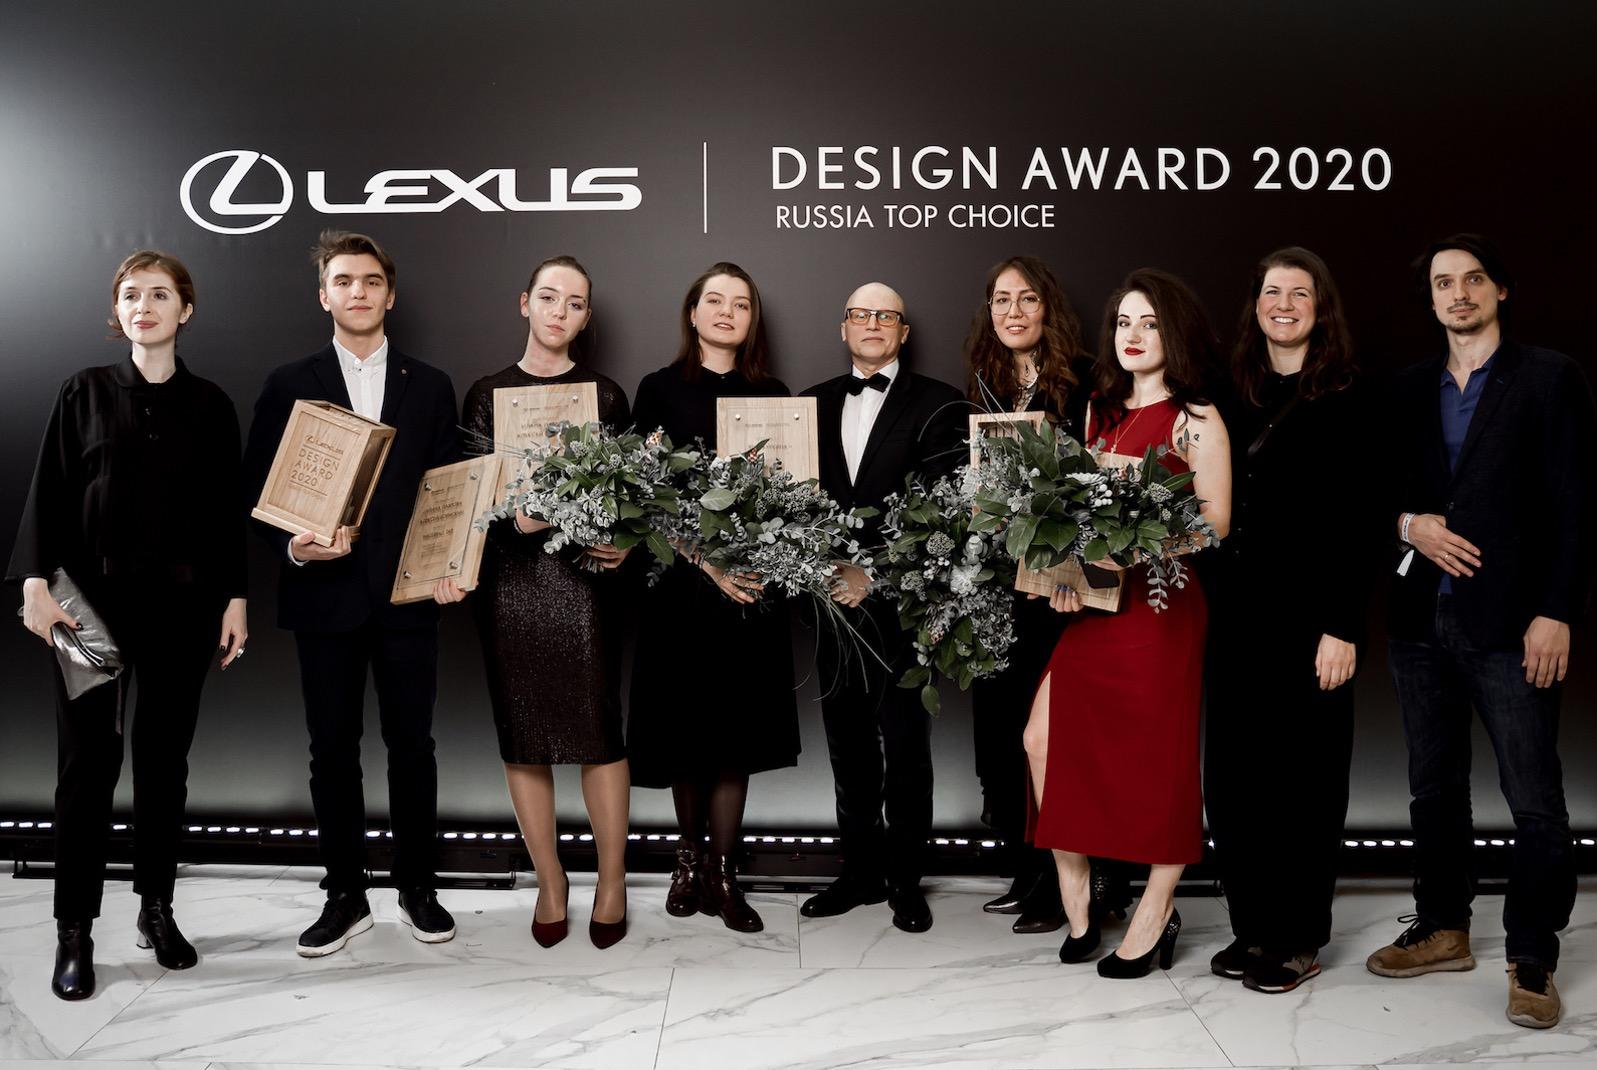 Lexus Design Award Russia Top Choice